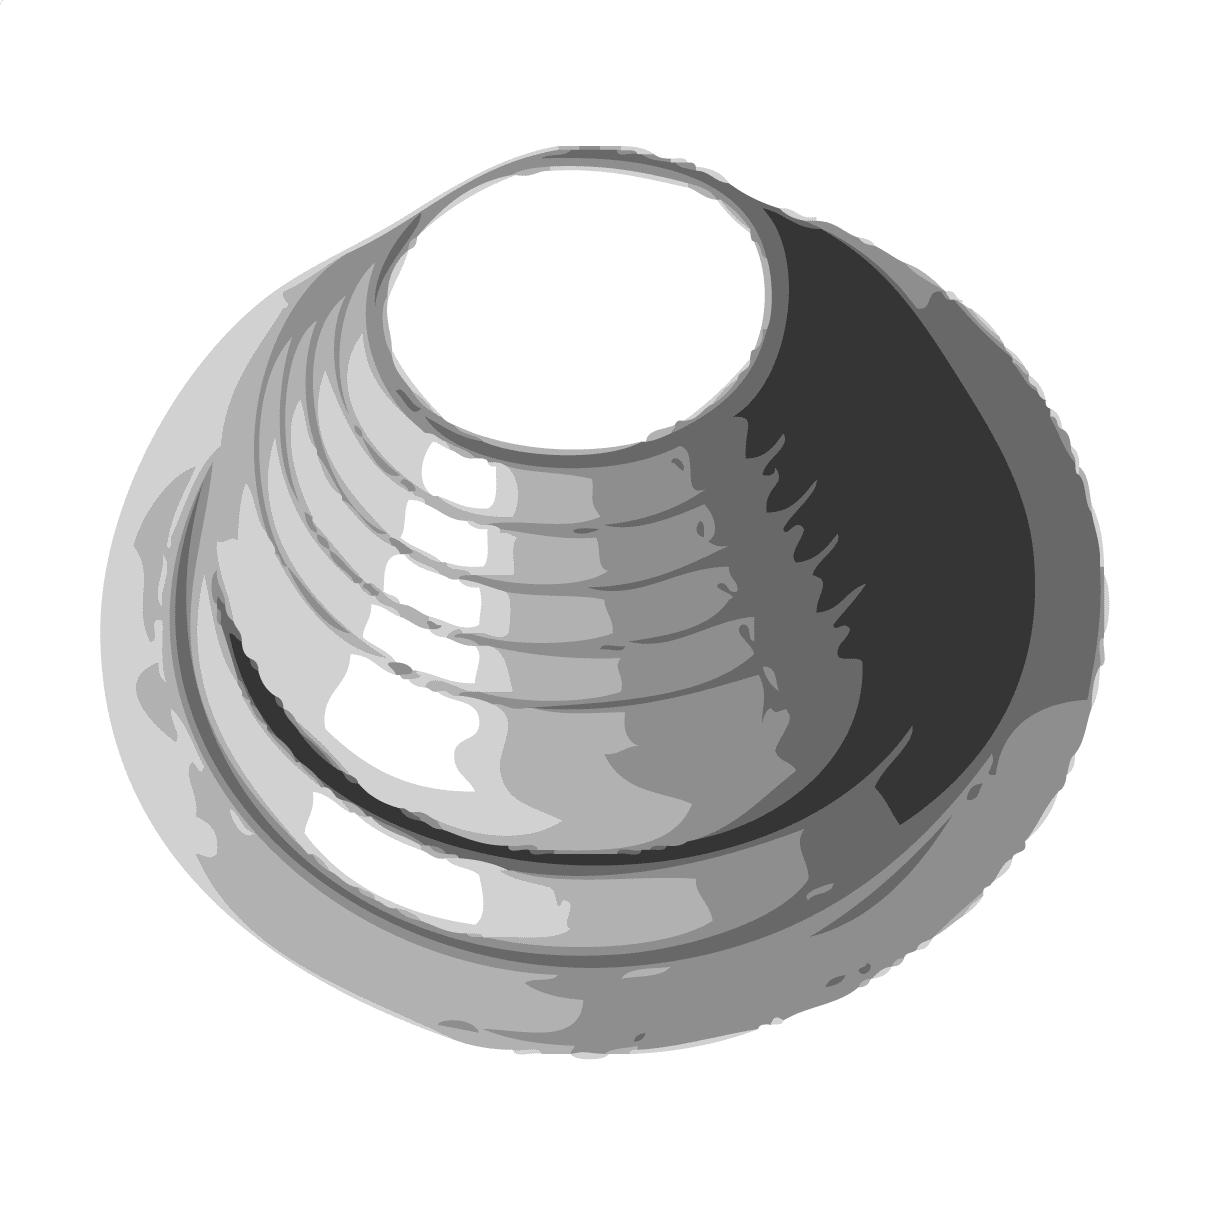 hightemp-silicone-pipe-boot